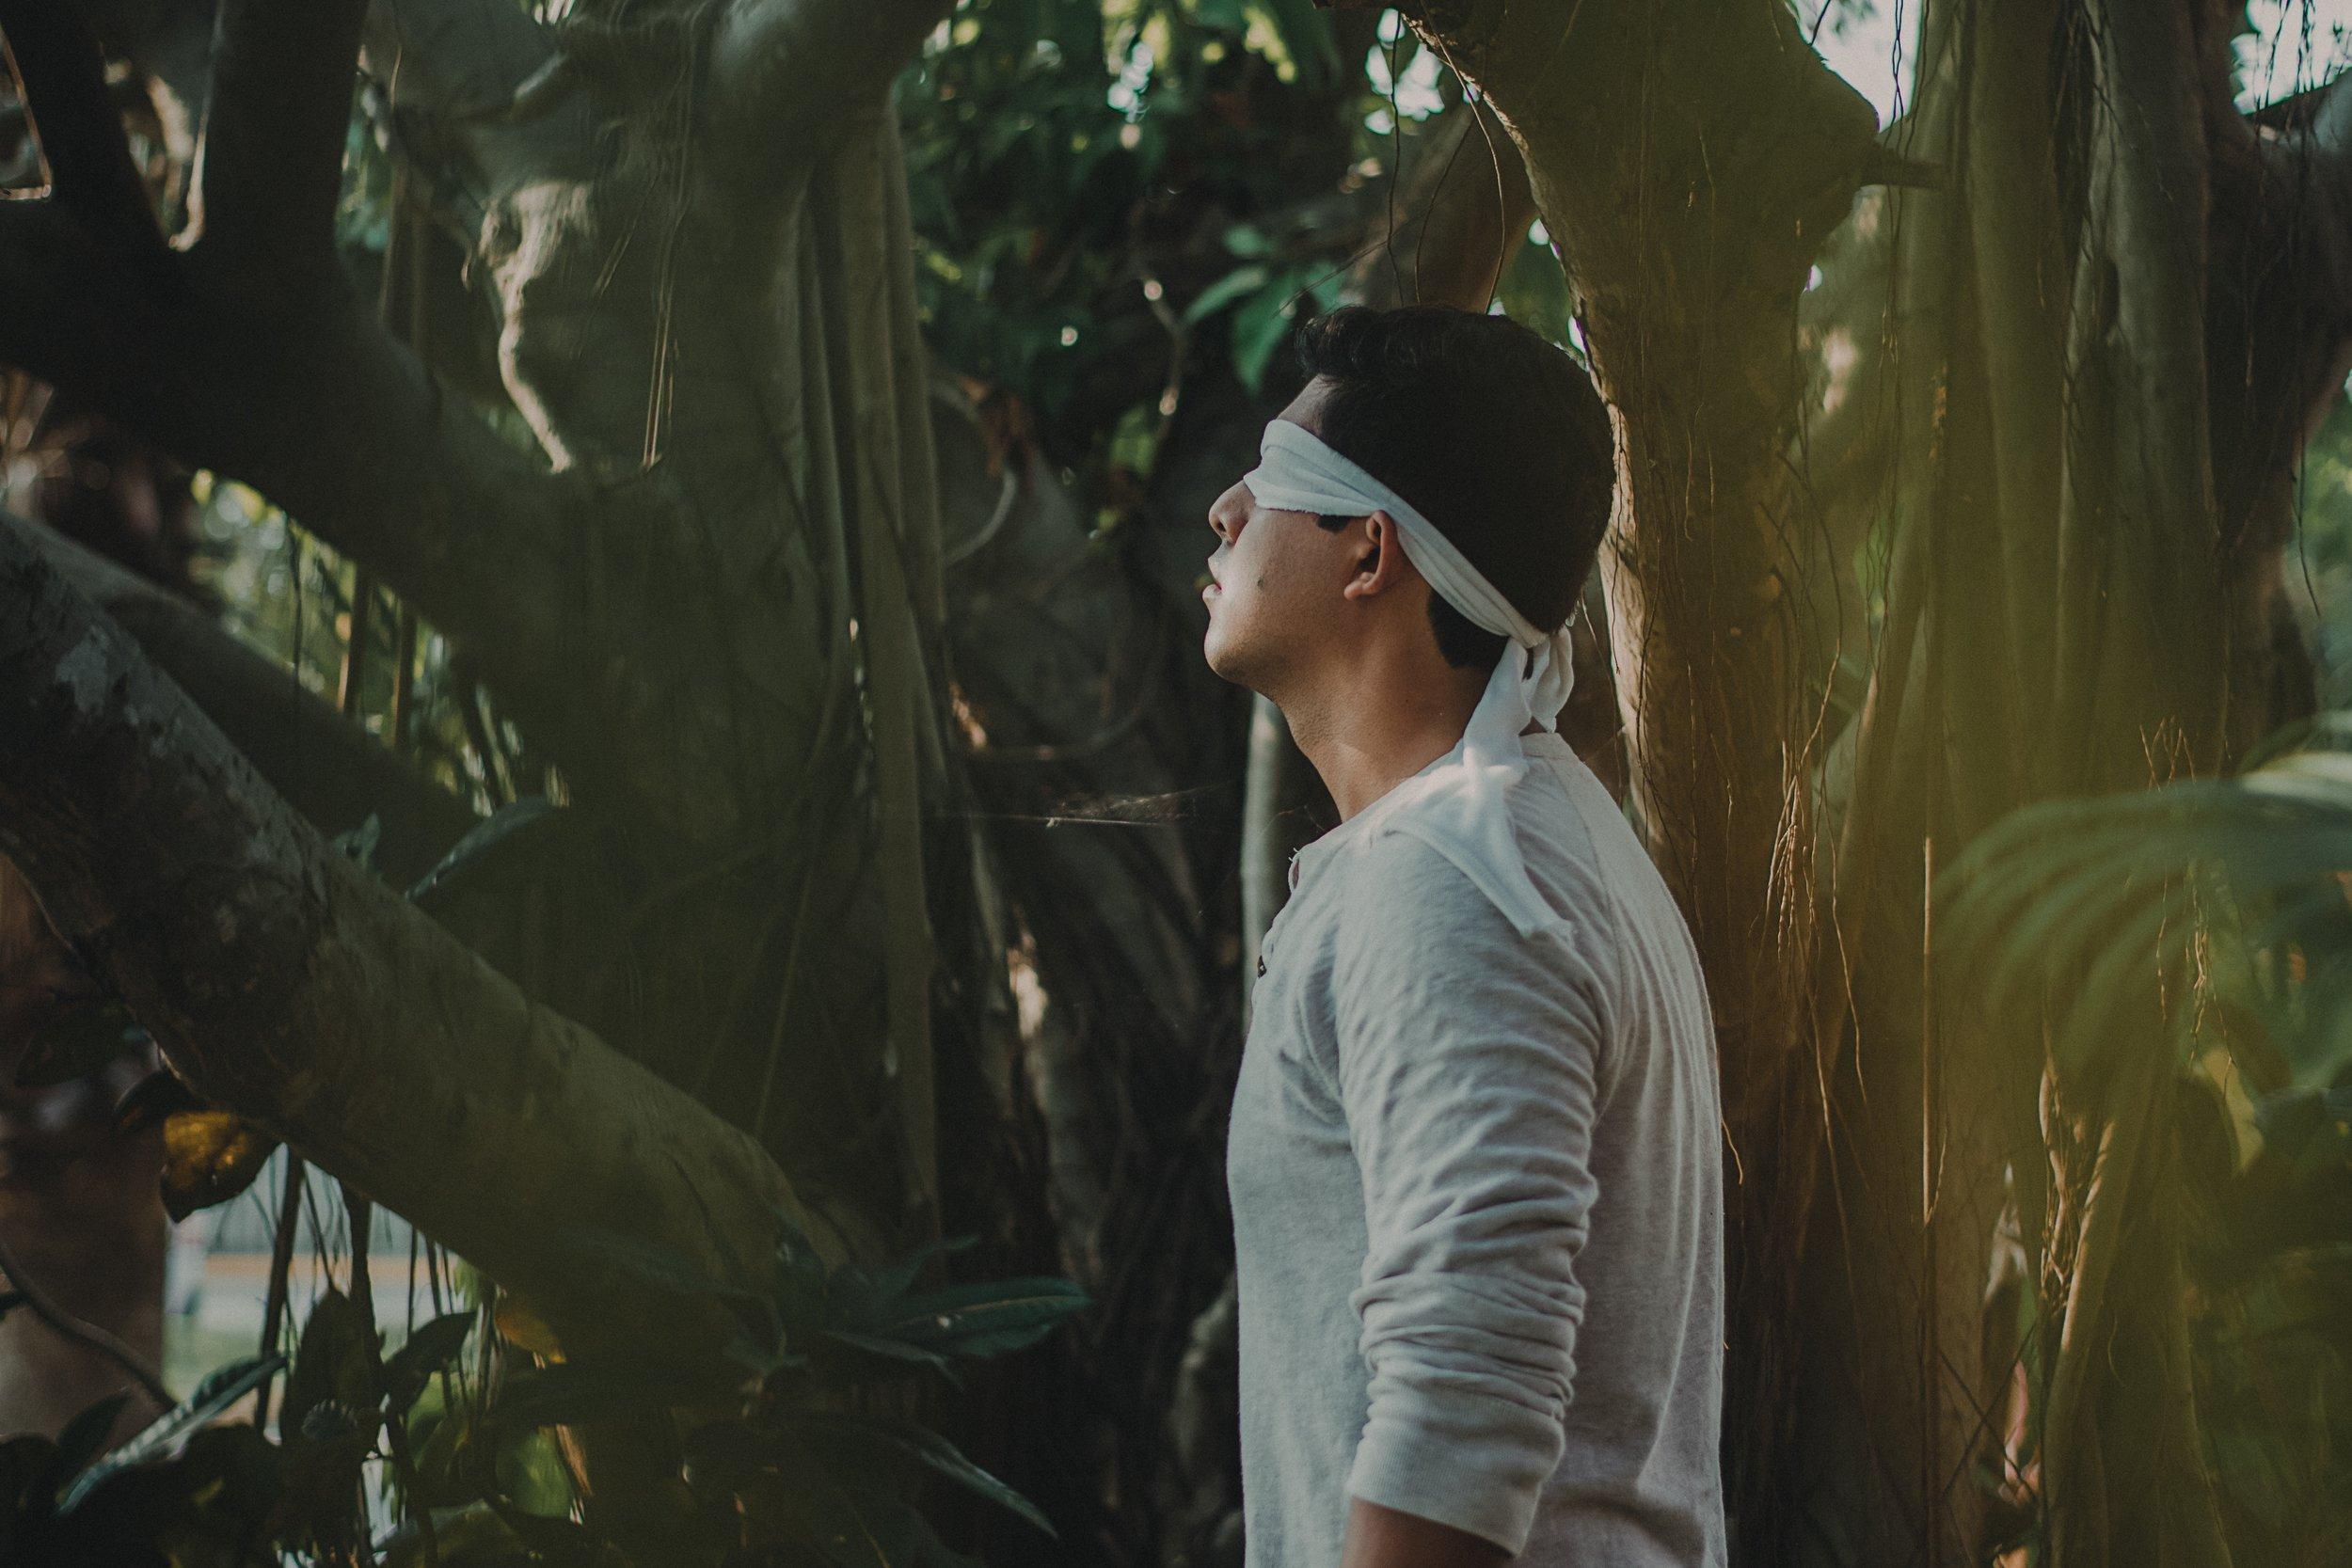 blindfolded-man-person-1278620.jpg